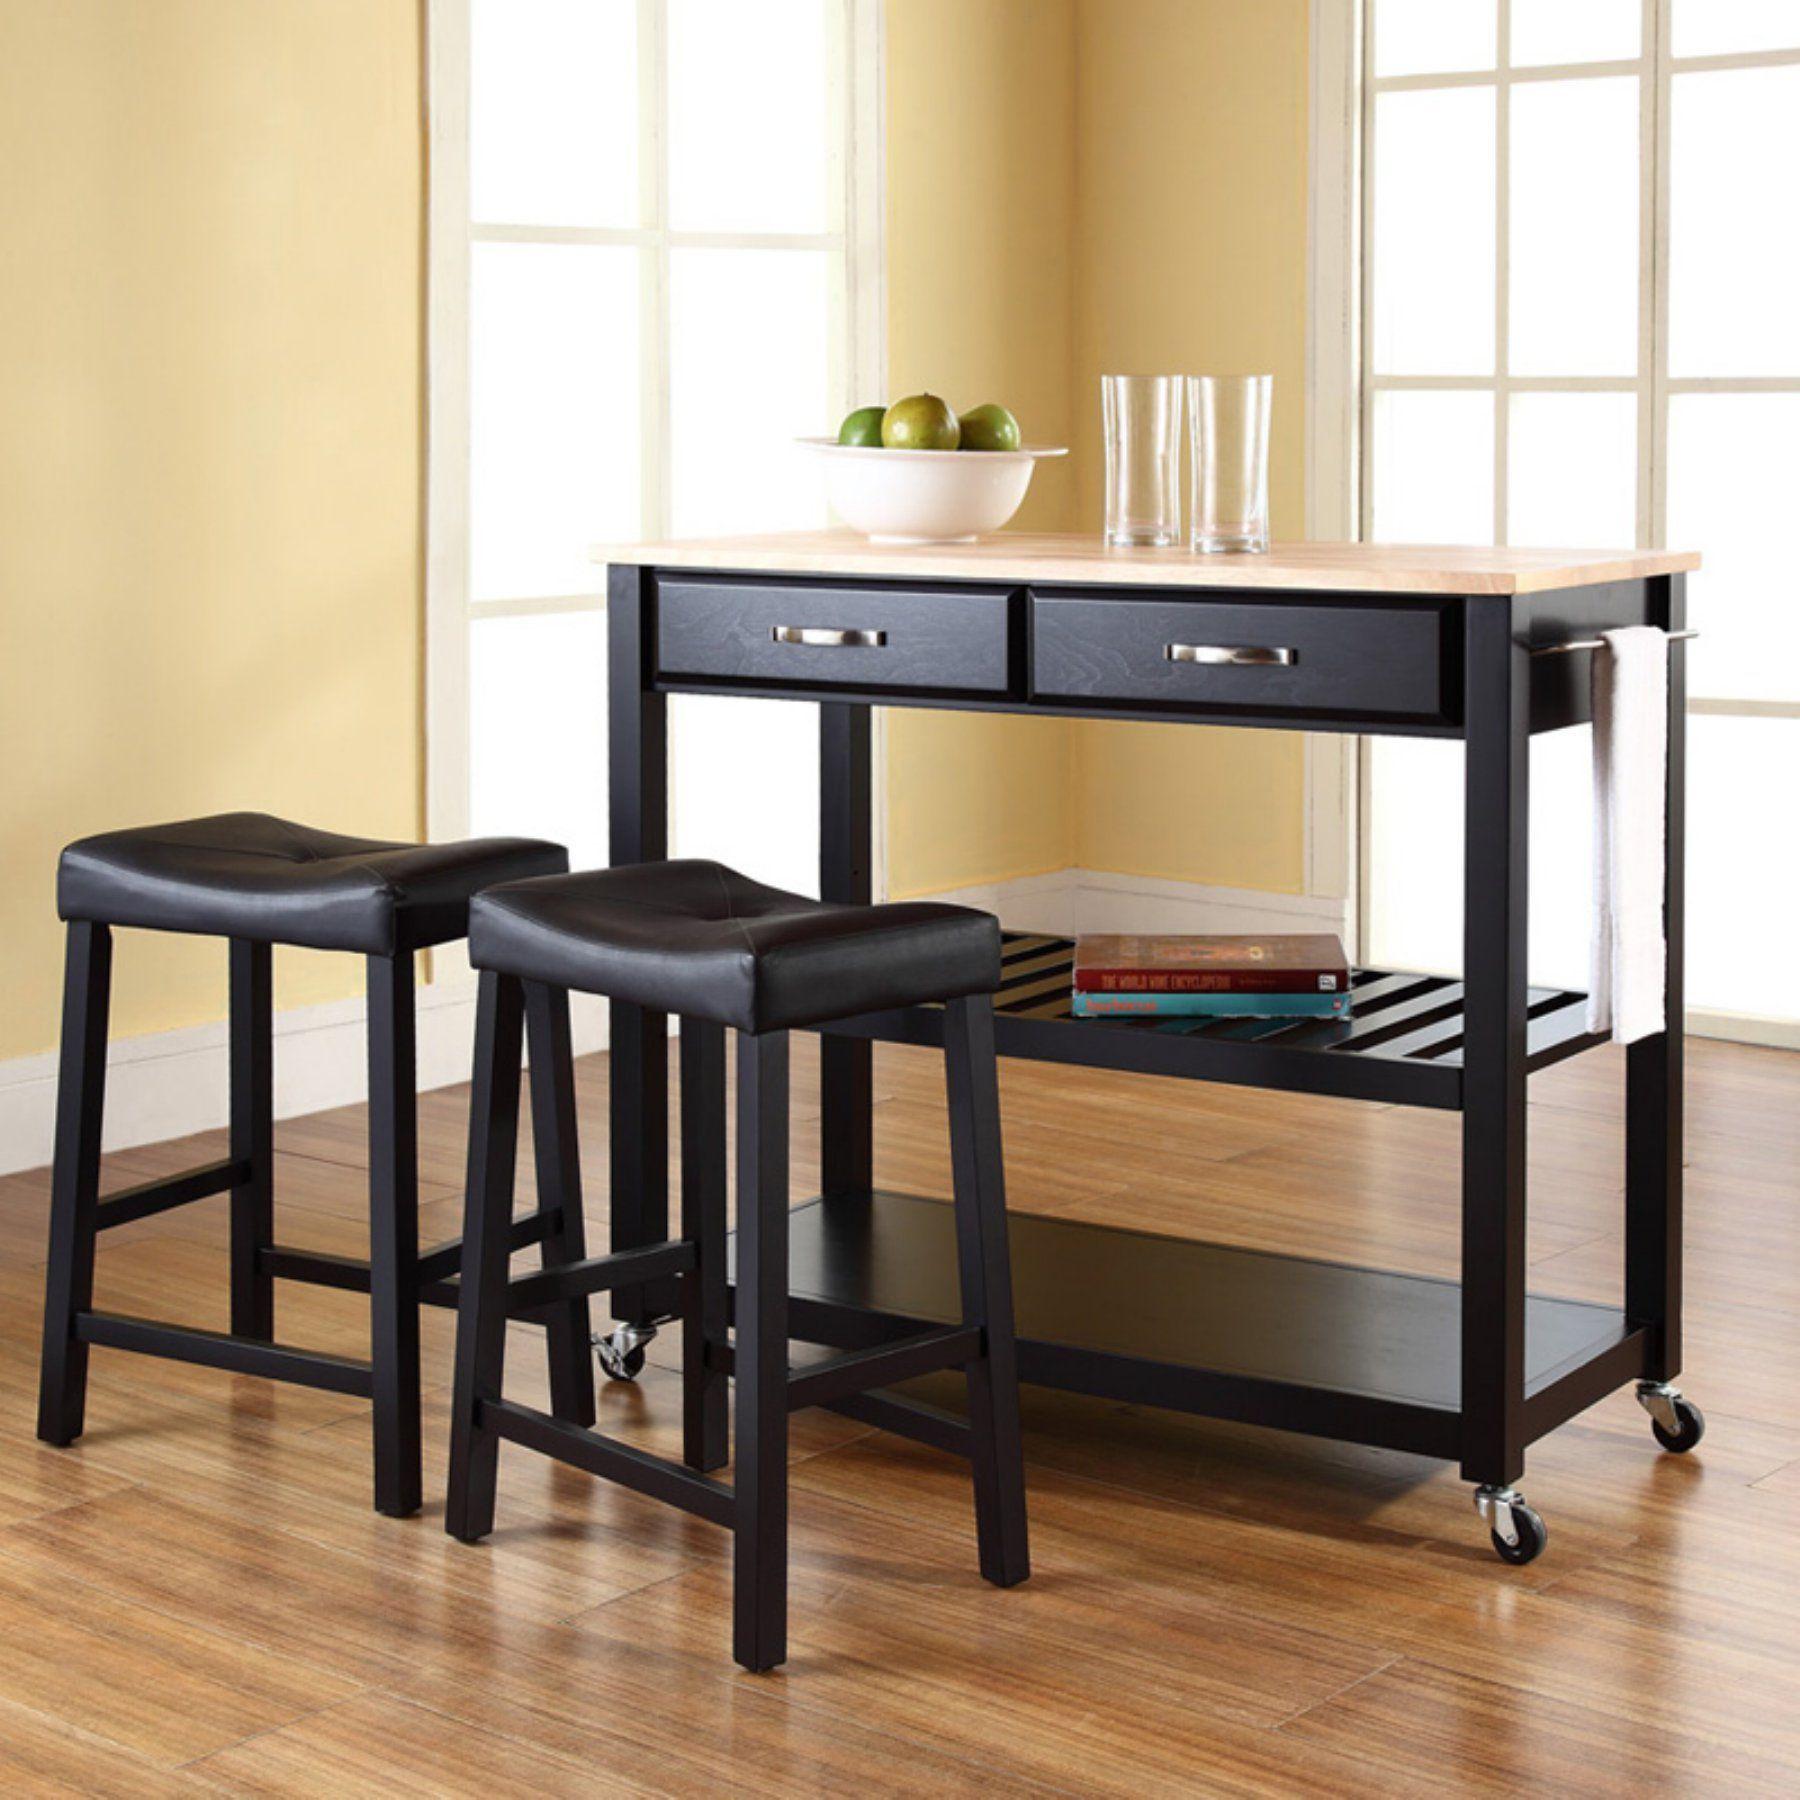 Crosley Kitchen Cart With Stools Kitchen Tops Granite Black Kitchens Kitchen Island Cart Kitchen island carts with stools